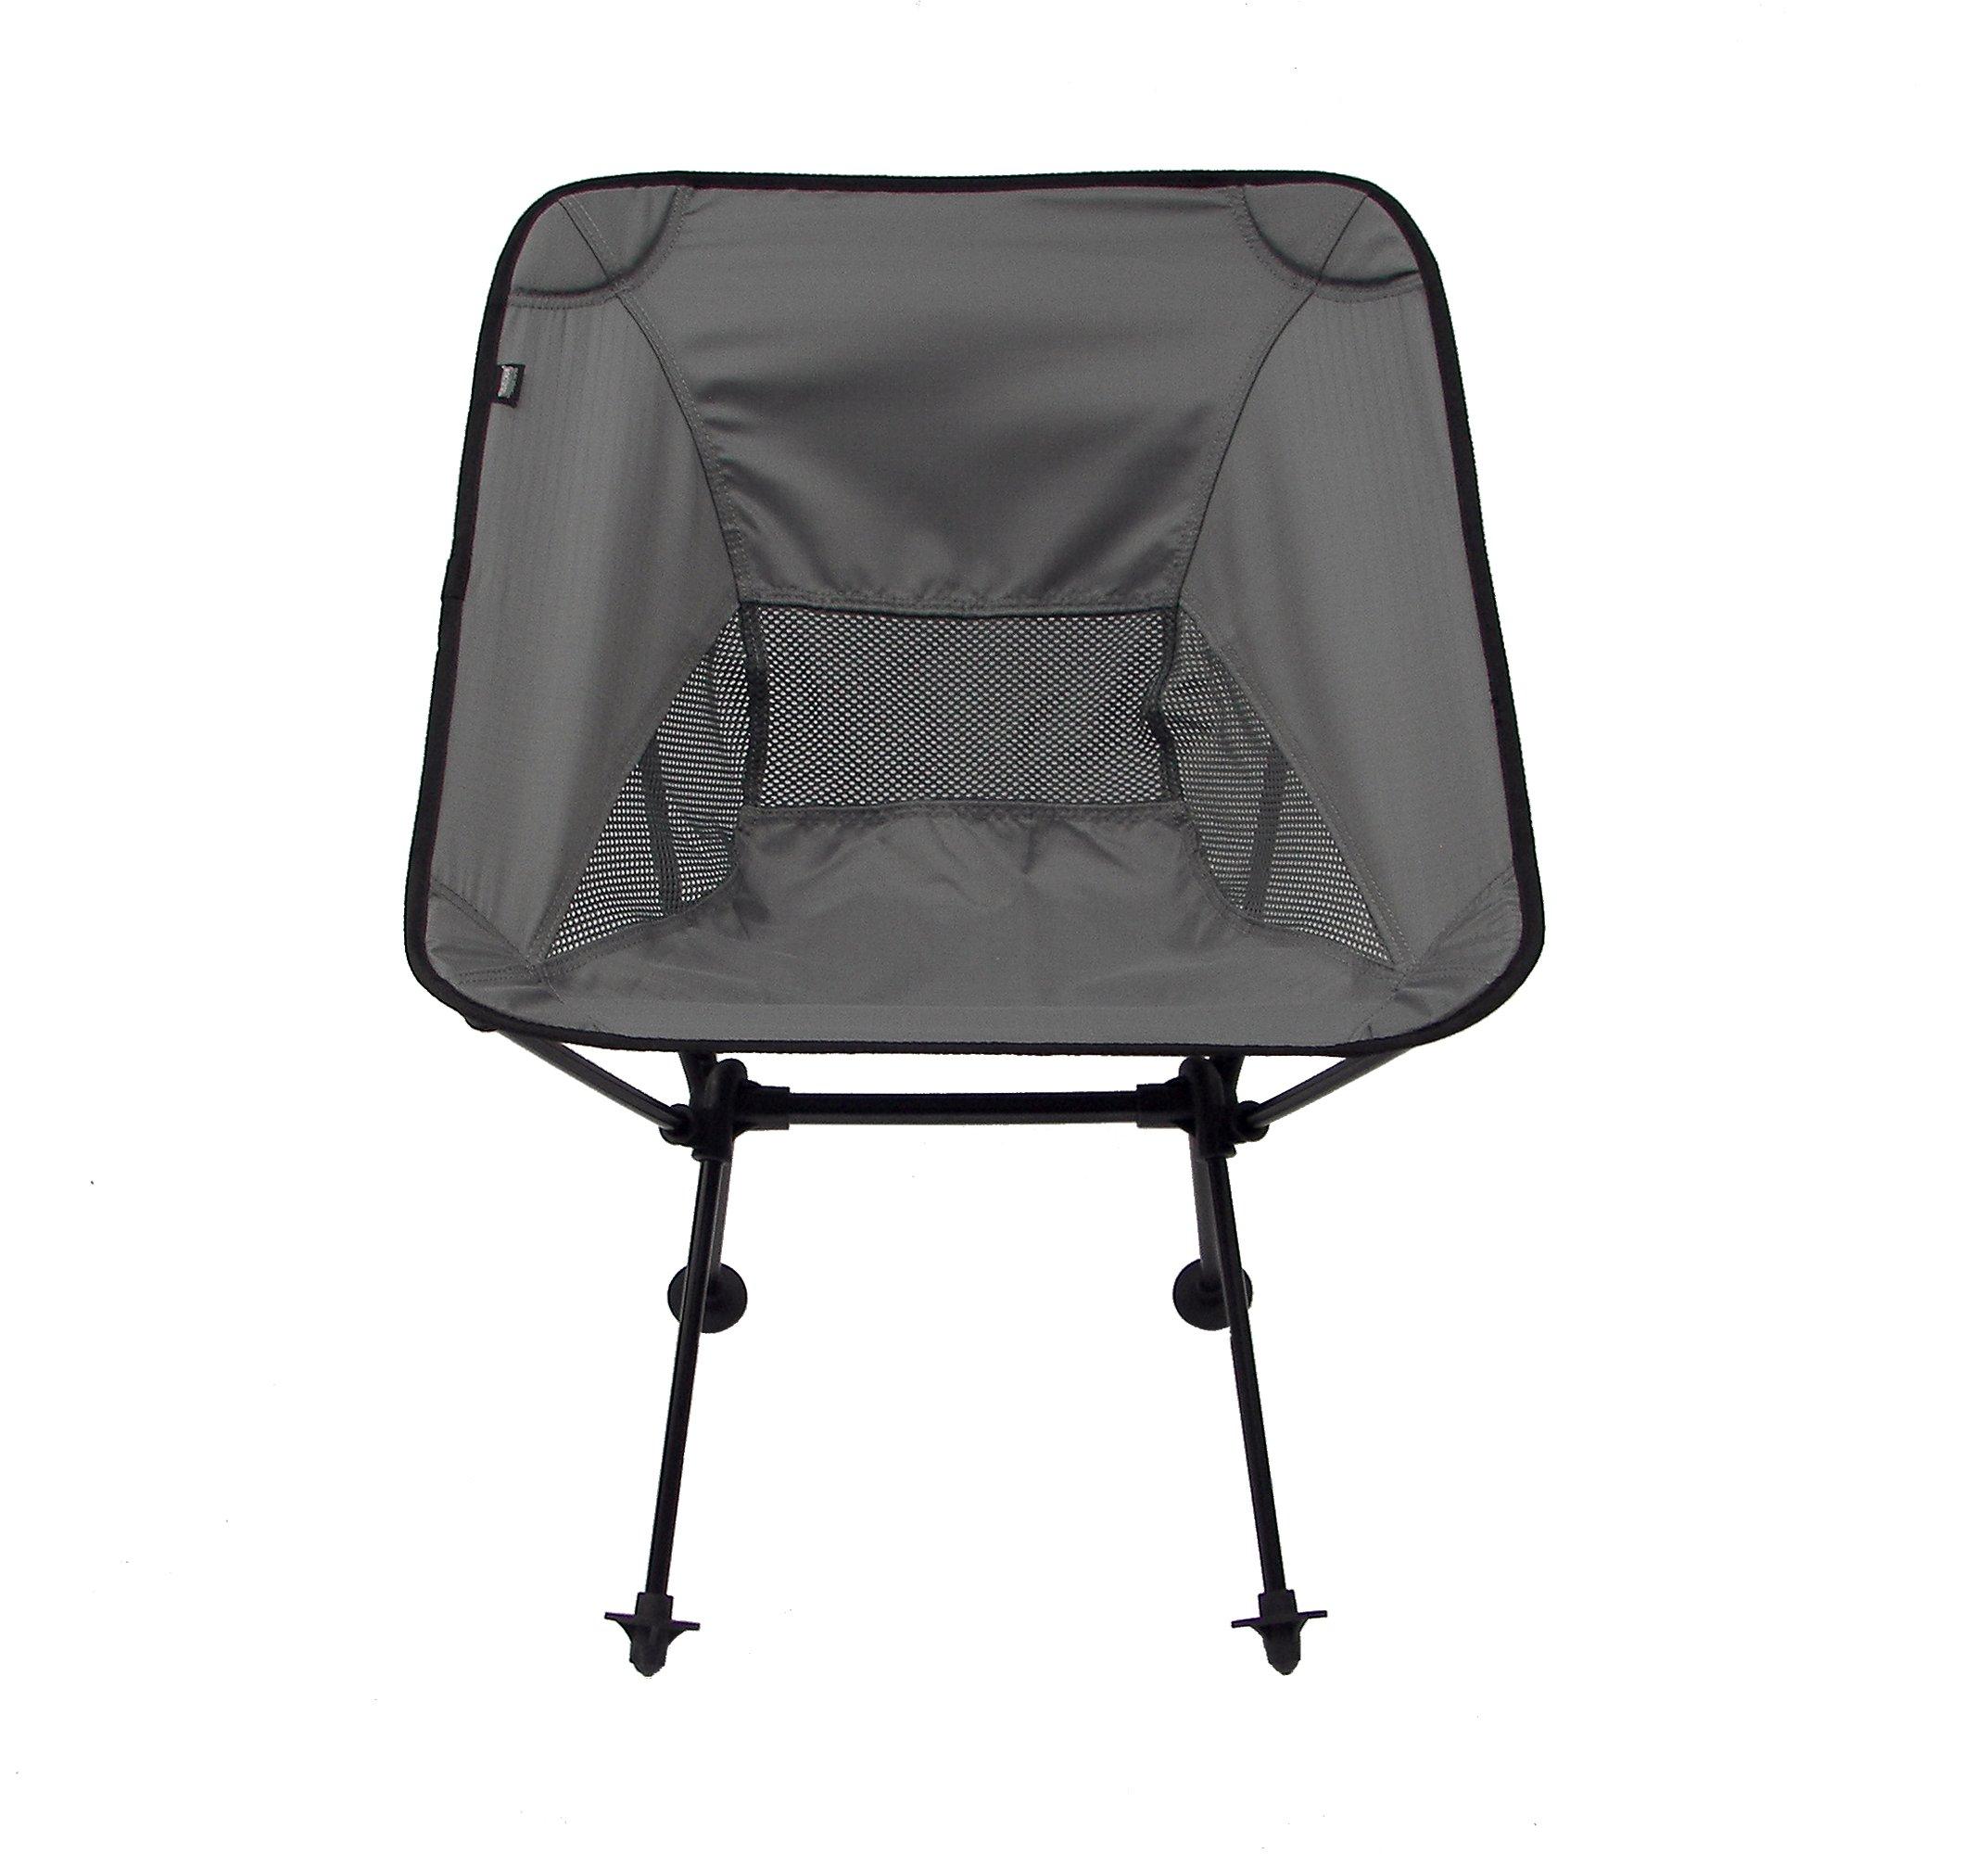 Travelchair Joey Chair, Black